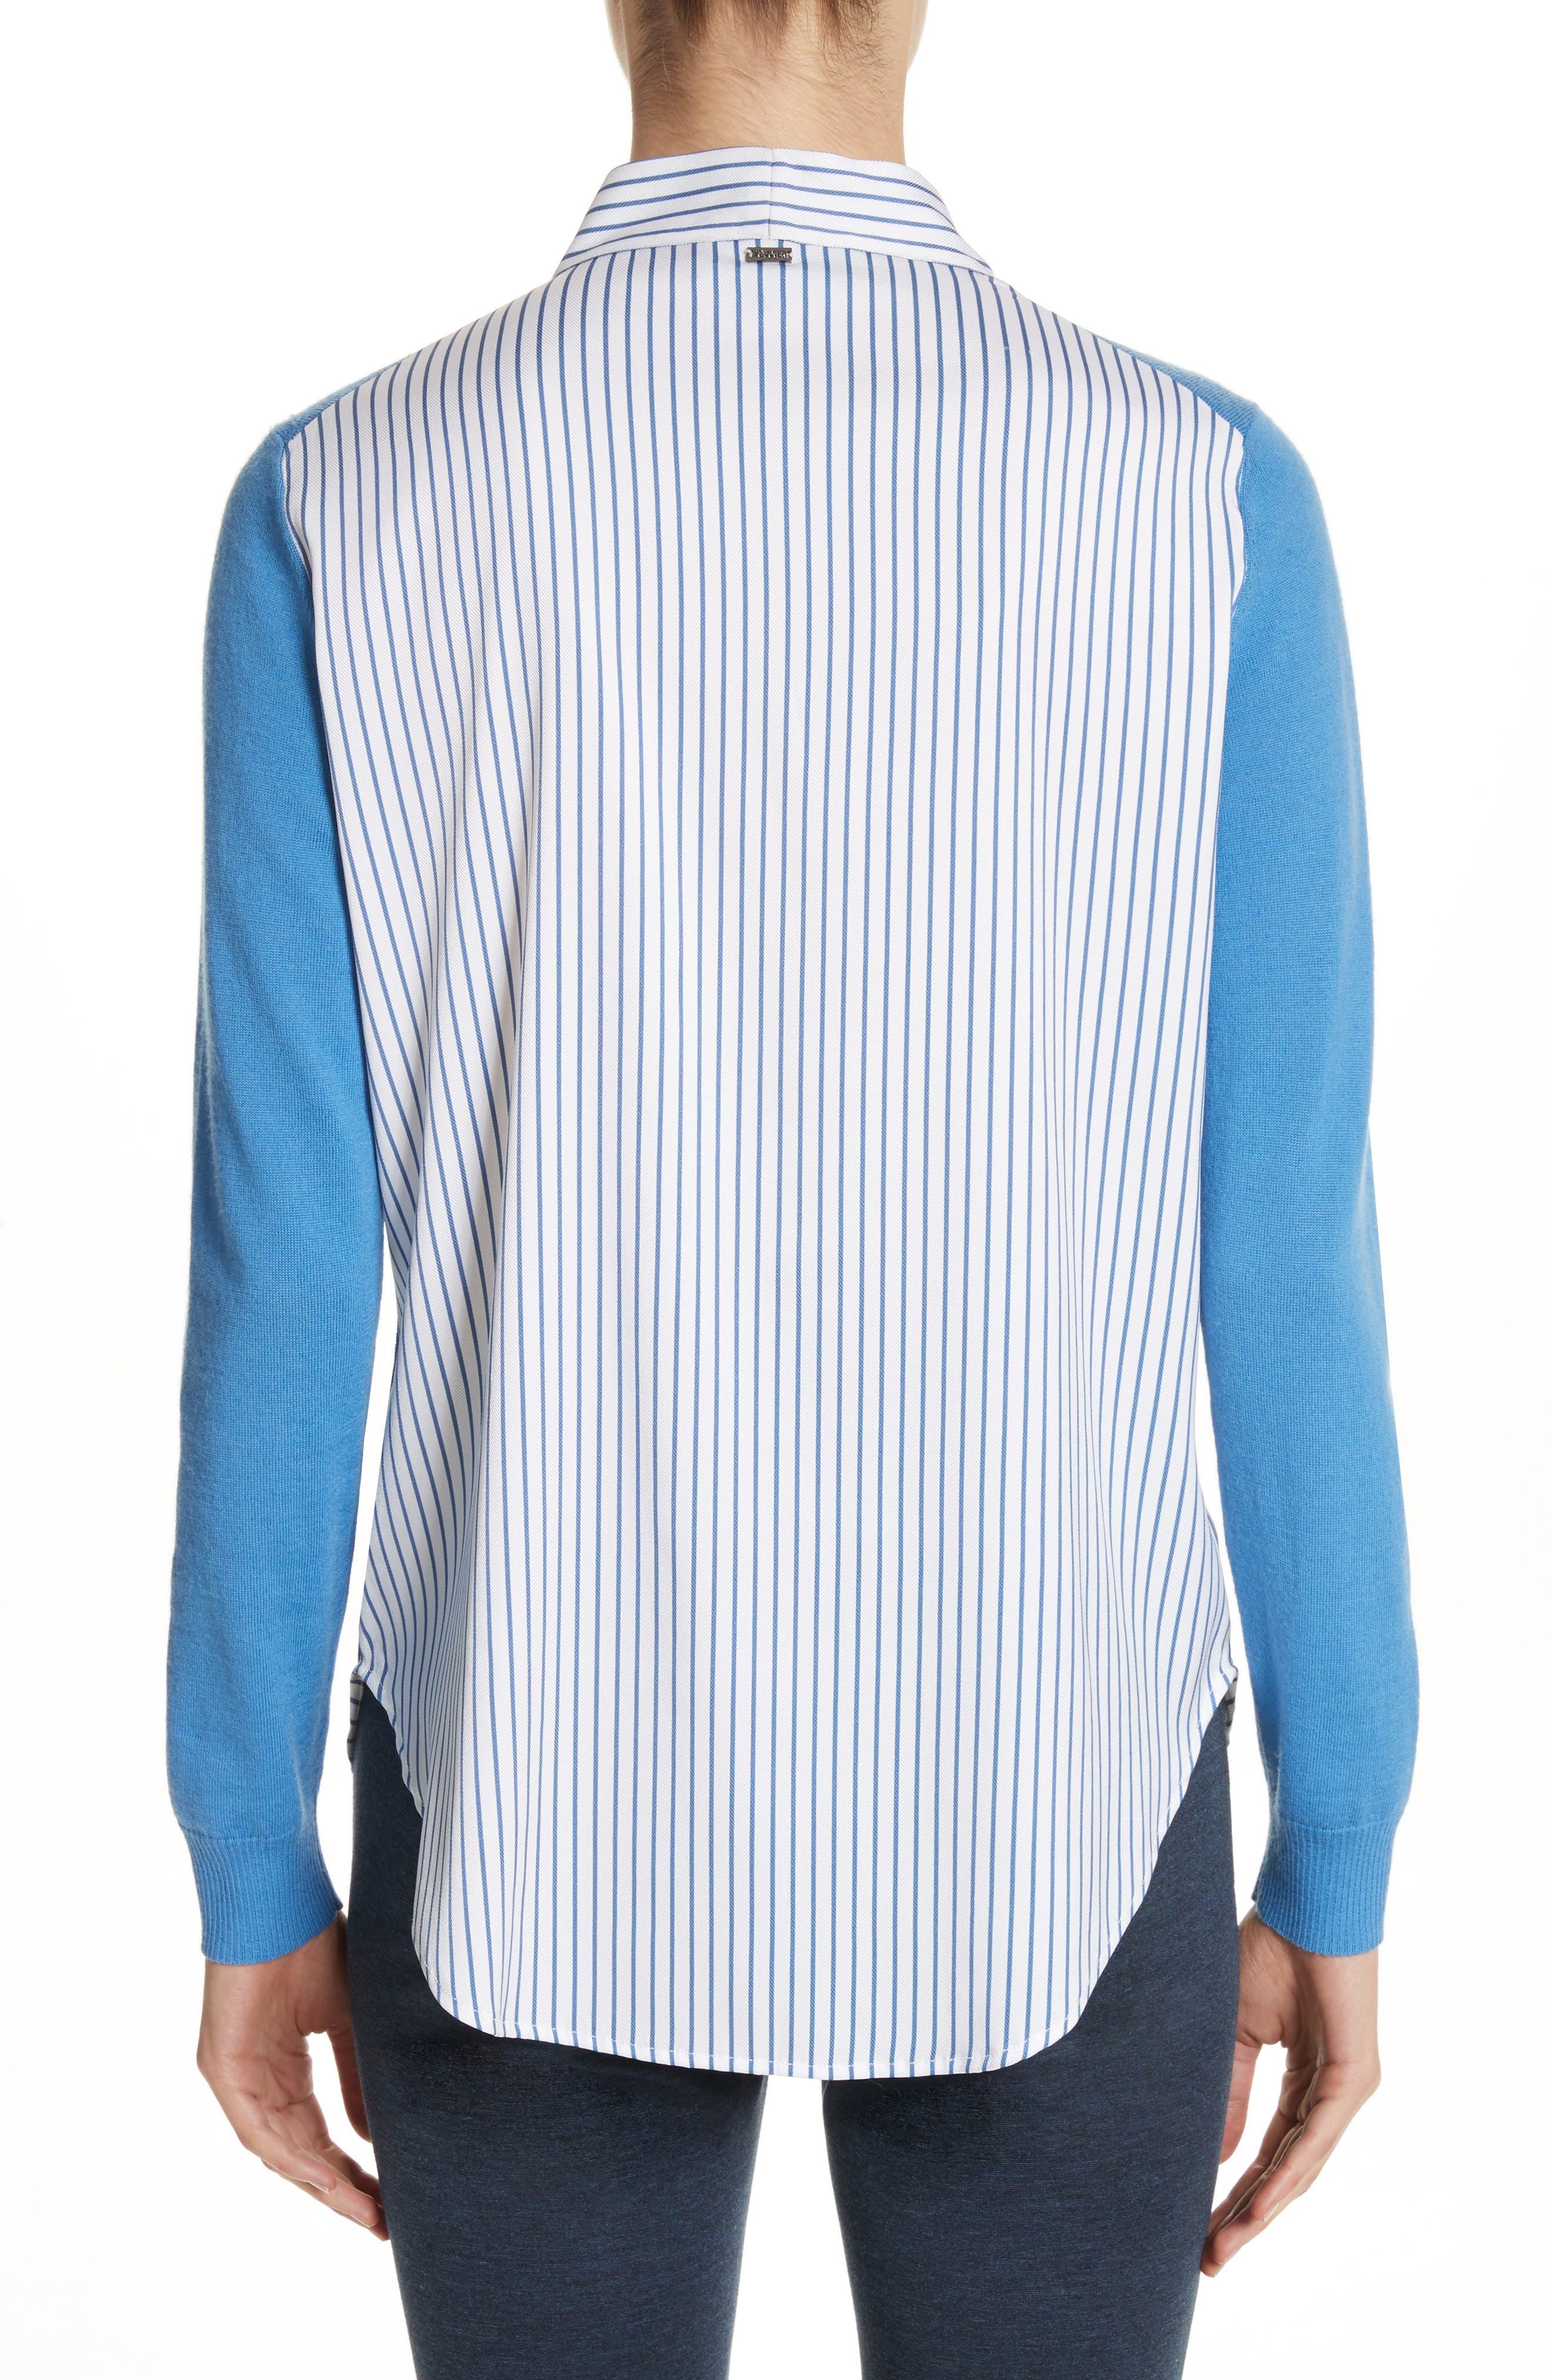 Alternate Image 2  - St. John Collection Layered Jersey Knit Cardigan